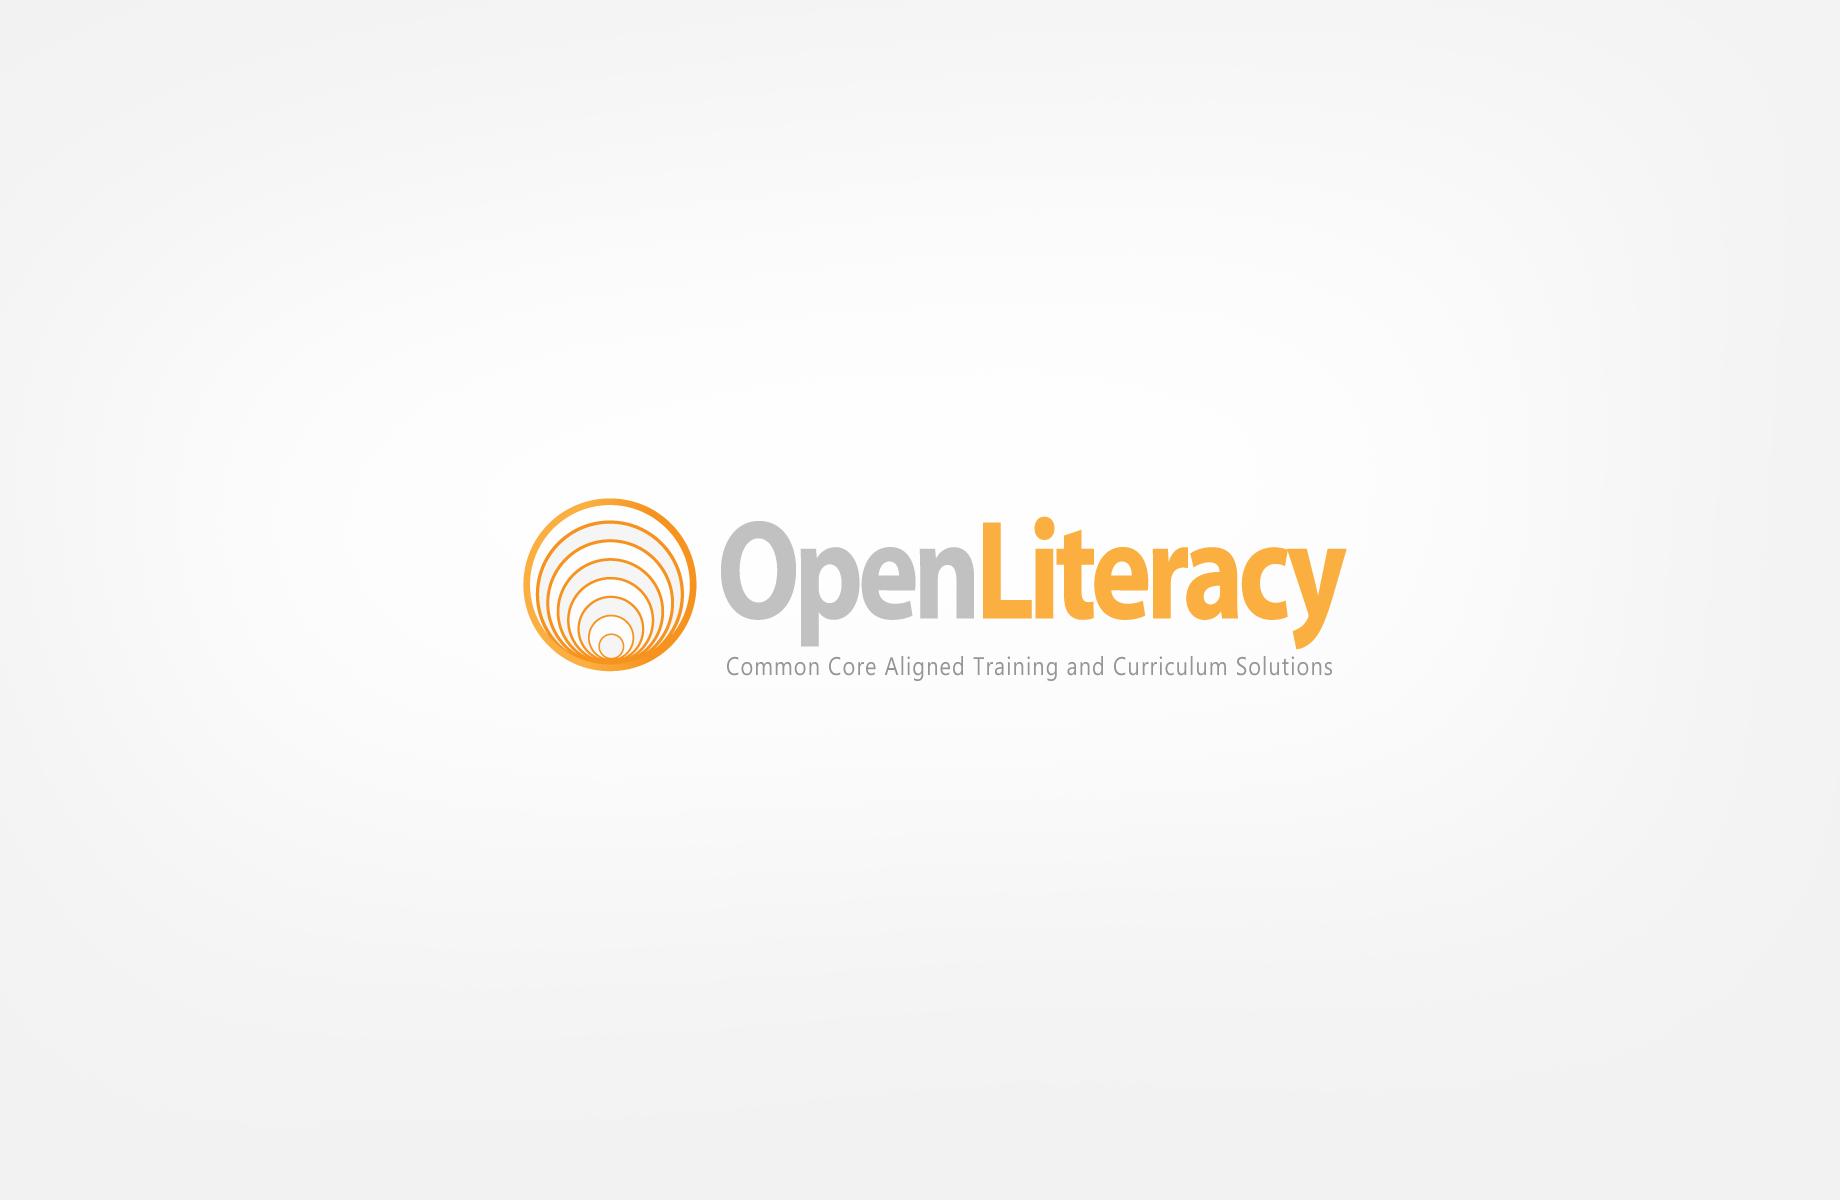 Logo Design by Jan Chua - Entry No. 67 in the Logo Design Contest Inspiring Logo Design for OpenLiteracy.